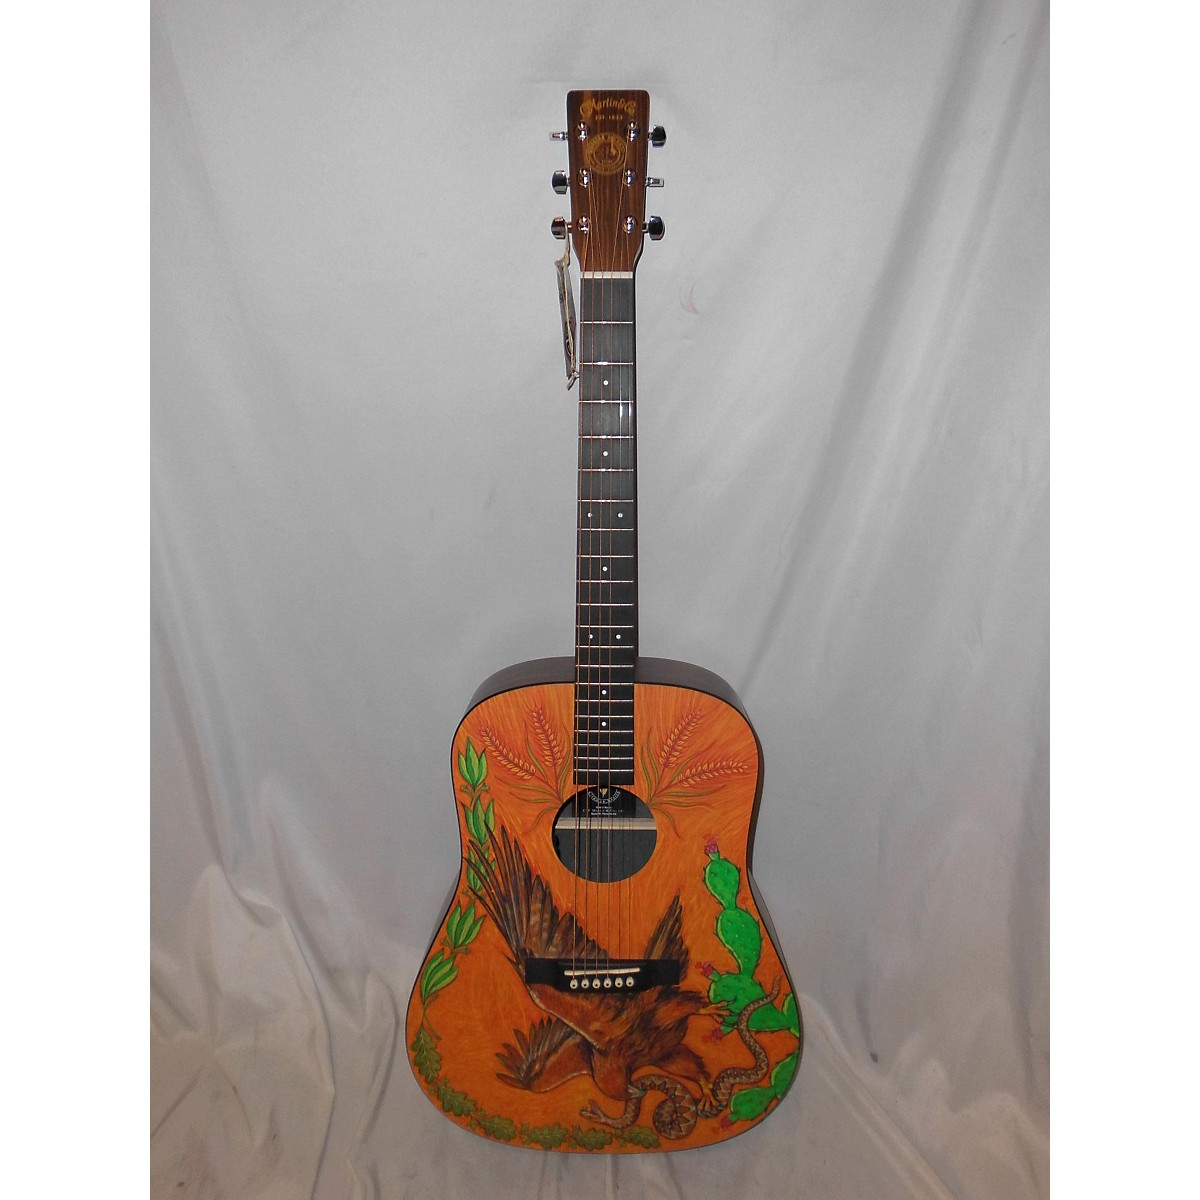 Martin DXMAE 30th Anniversary Dreadnaught Acoustic Electric Guitar